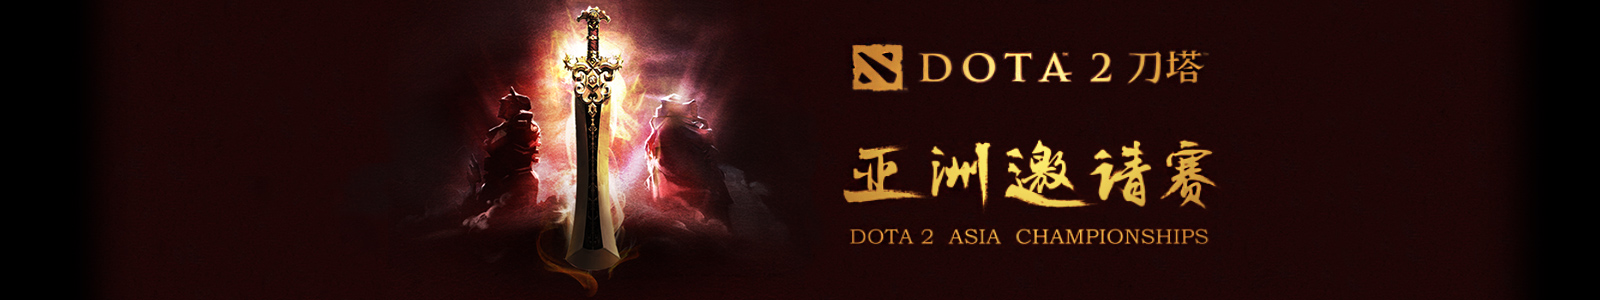 Main Page giant banner DAC 2015.jpg